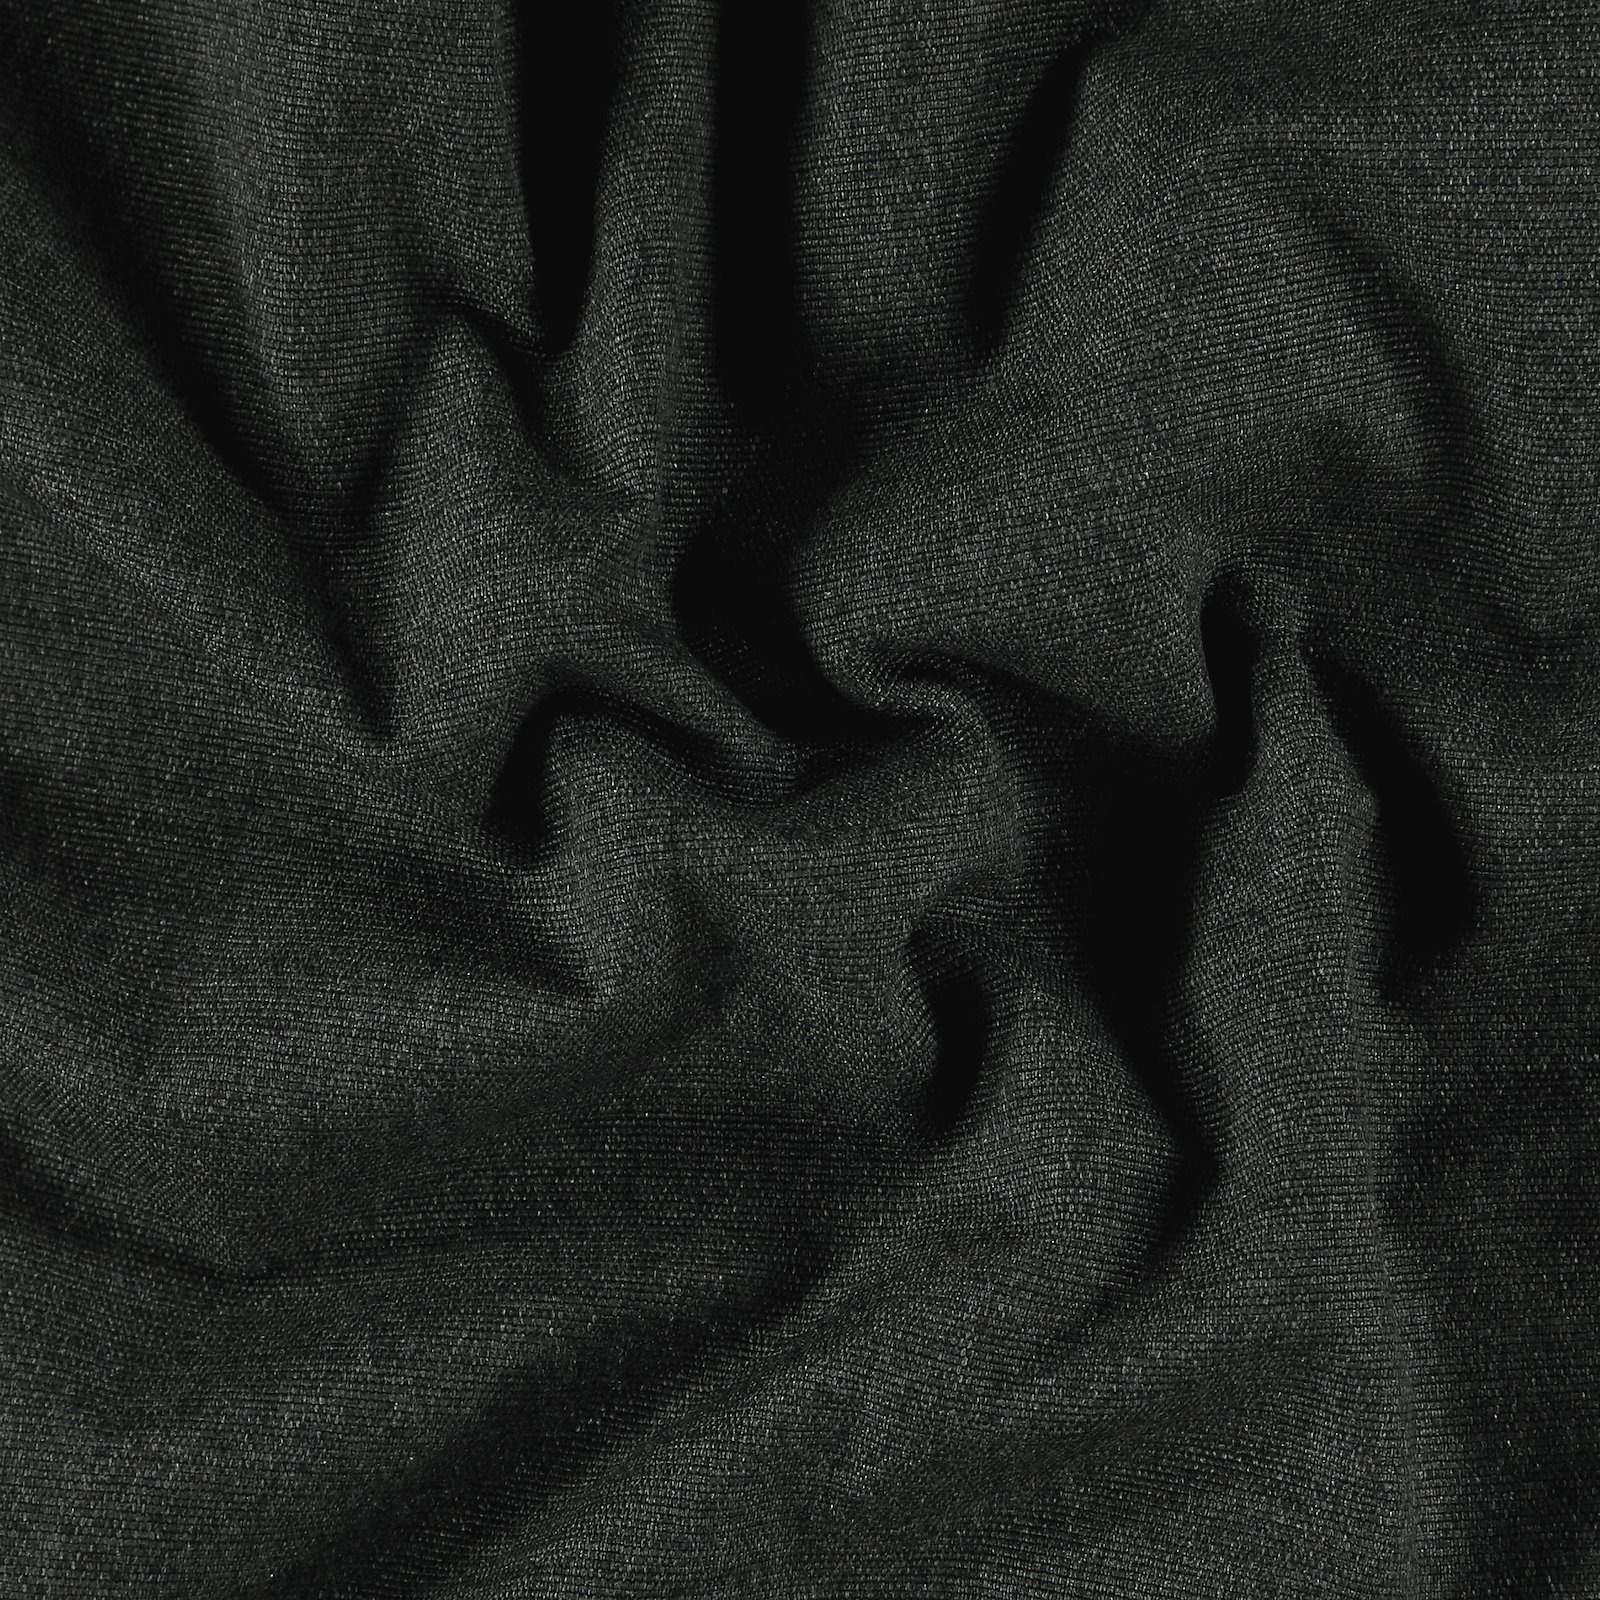 Upholstery fabric dark grey w/backing